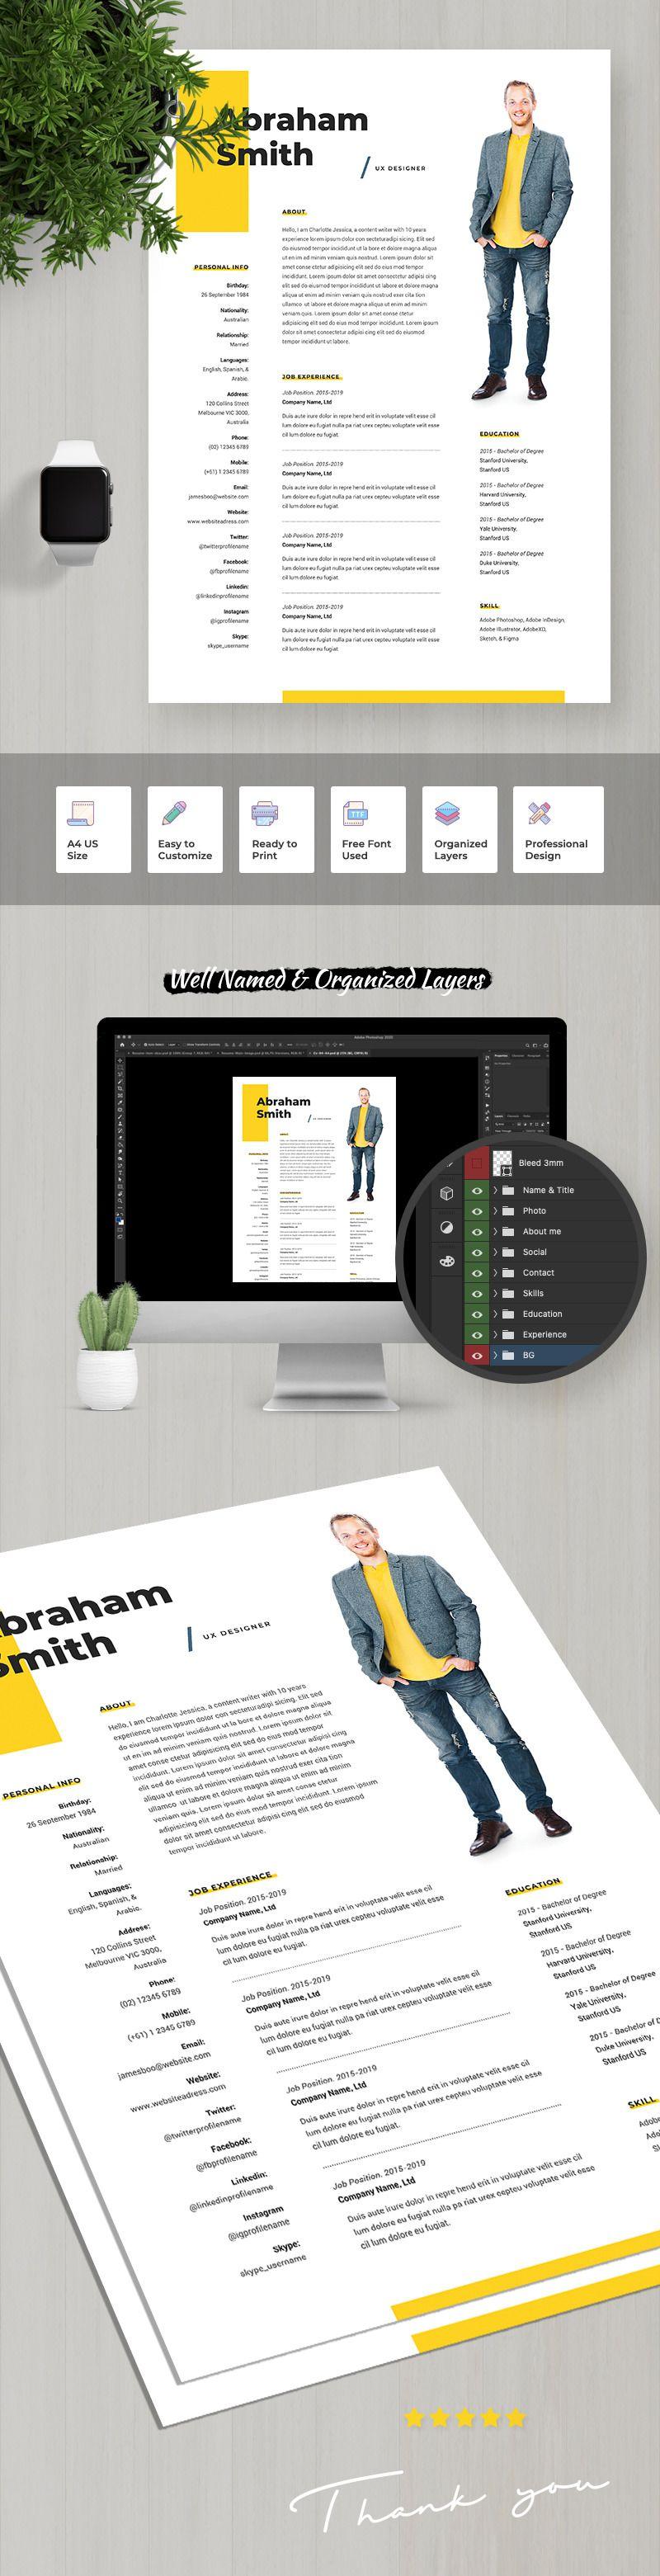 Abraham smith ux designer resume template 107916 in